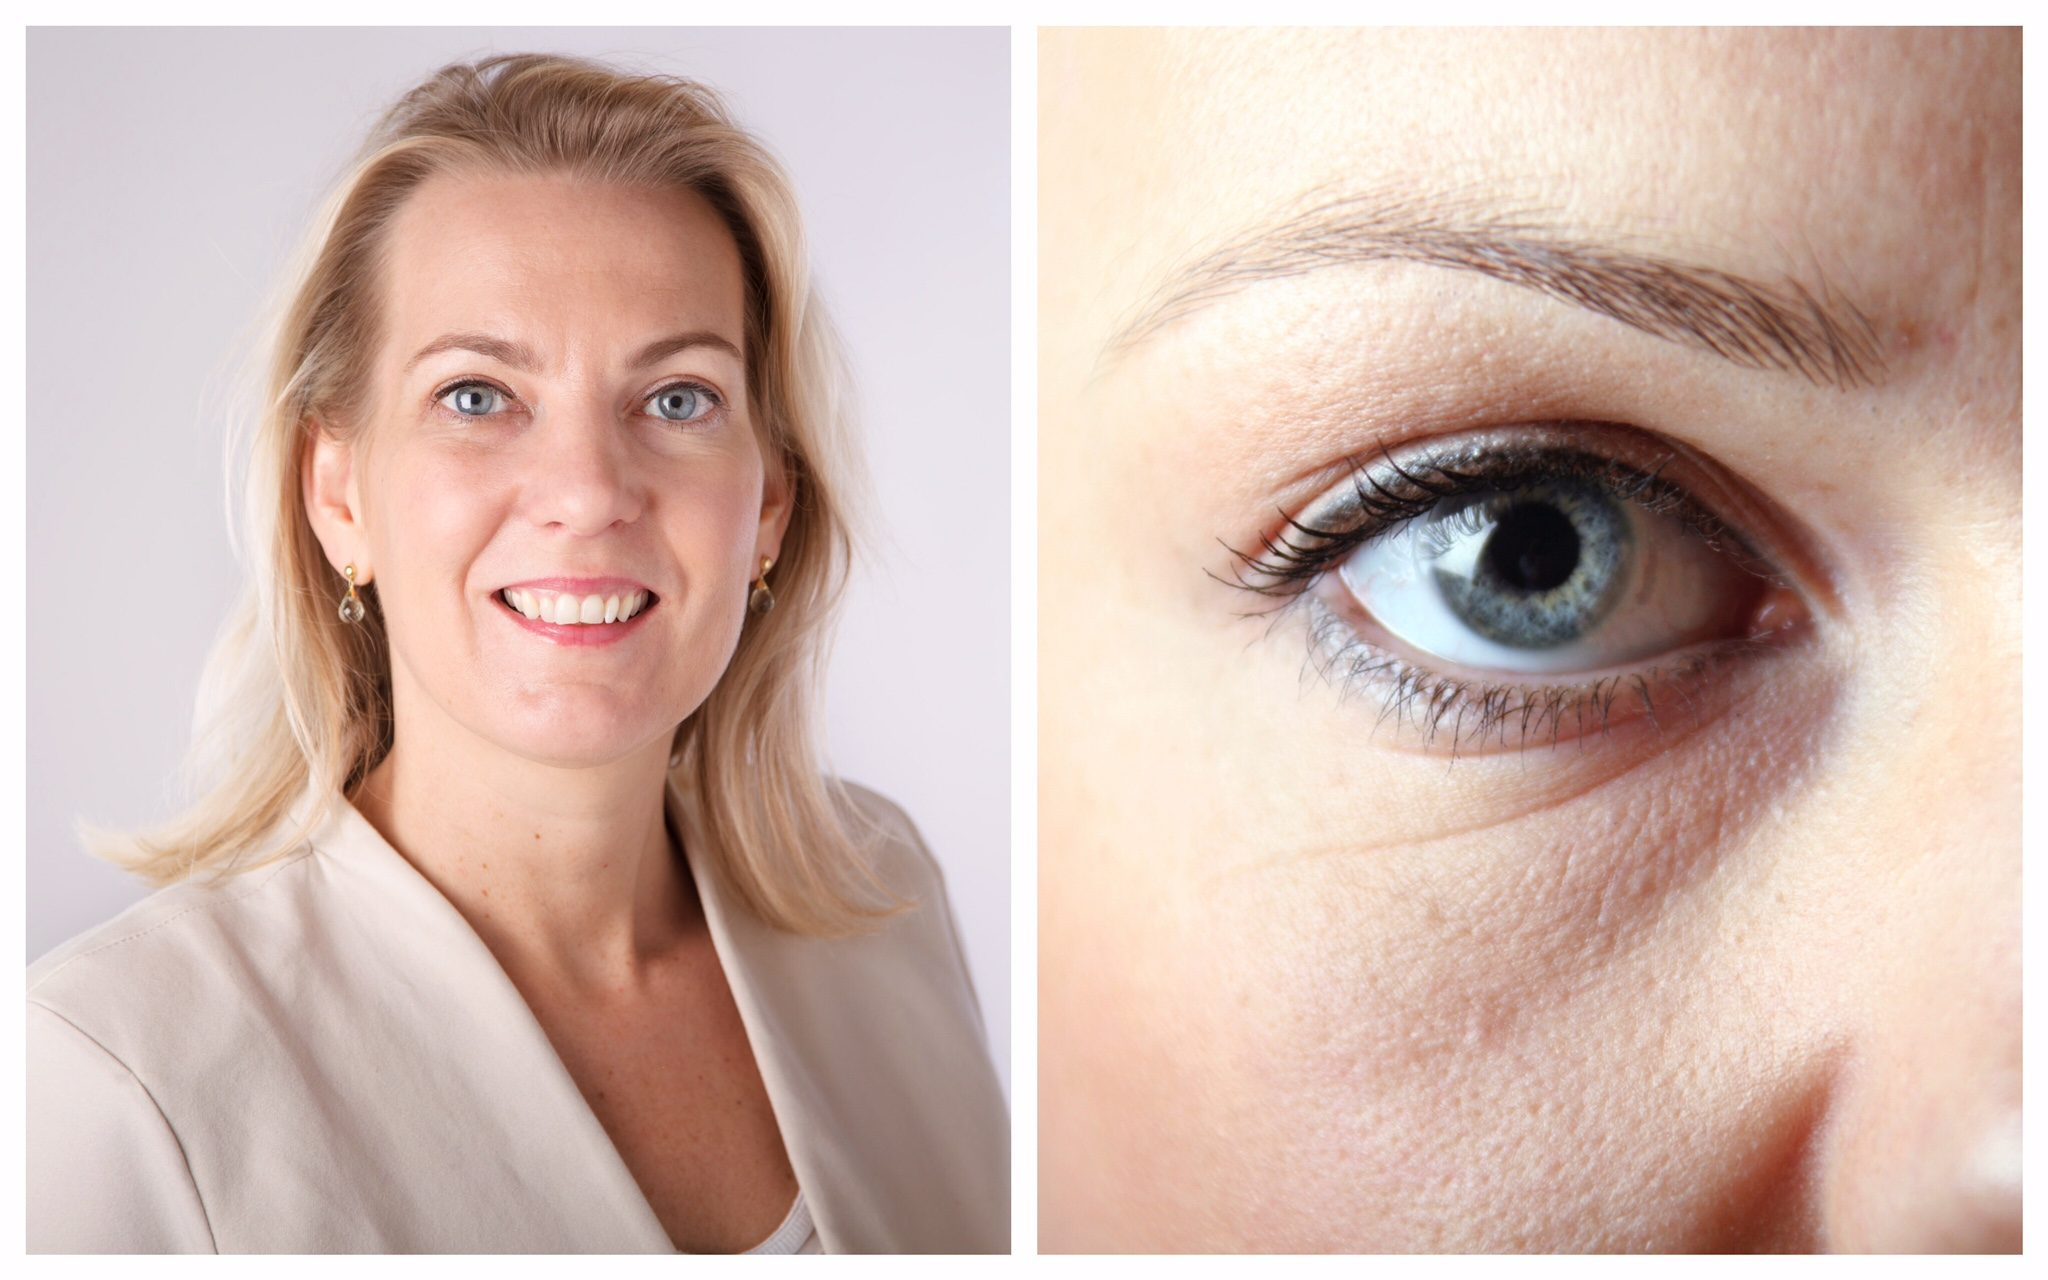 ua paula roossink ooglid correctie beautyjournaal